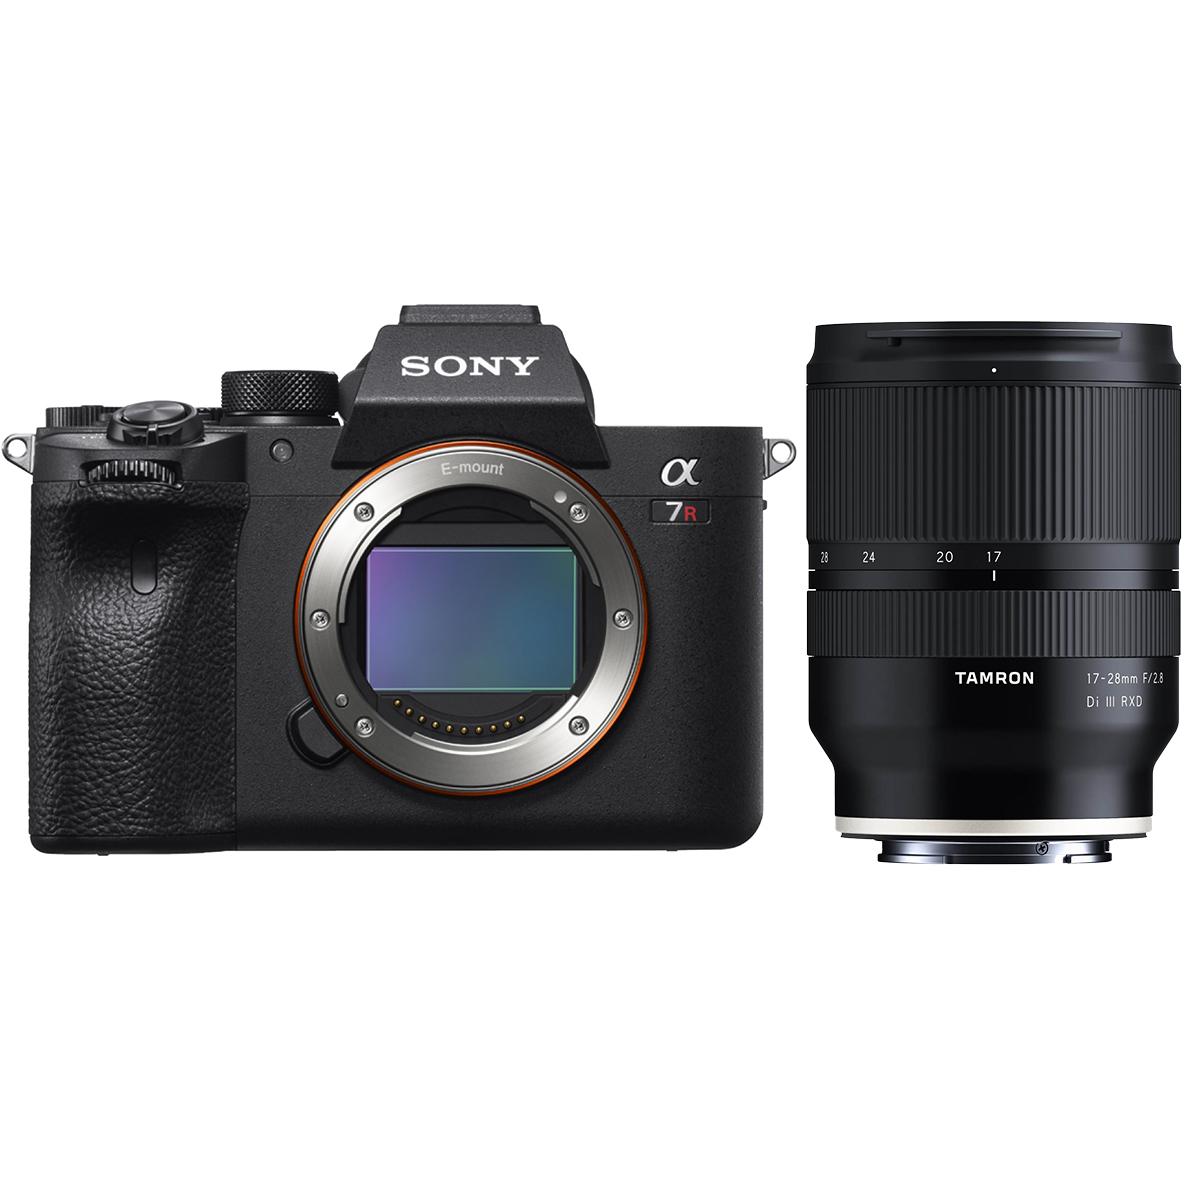 Sony Alpha 7R IV + Tamron 17-28mm 1:2,8 Di III RXD